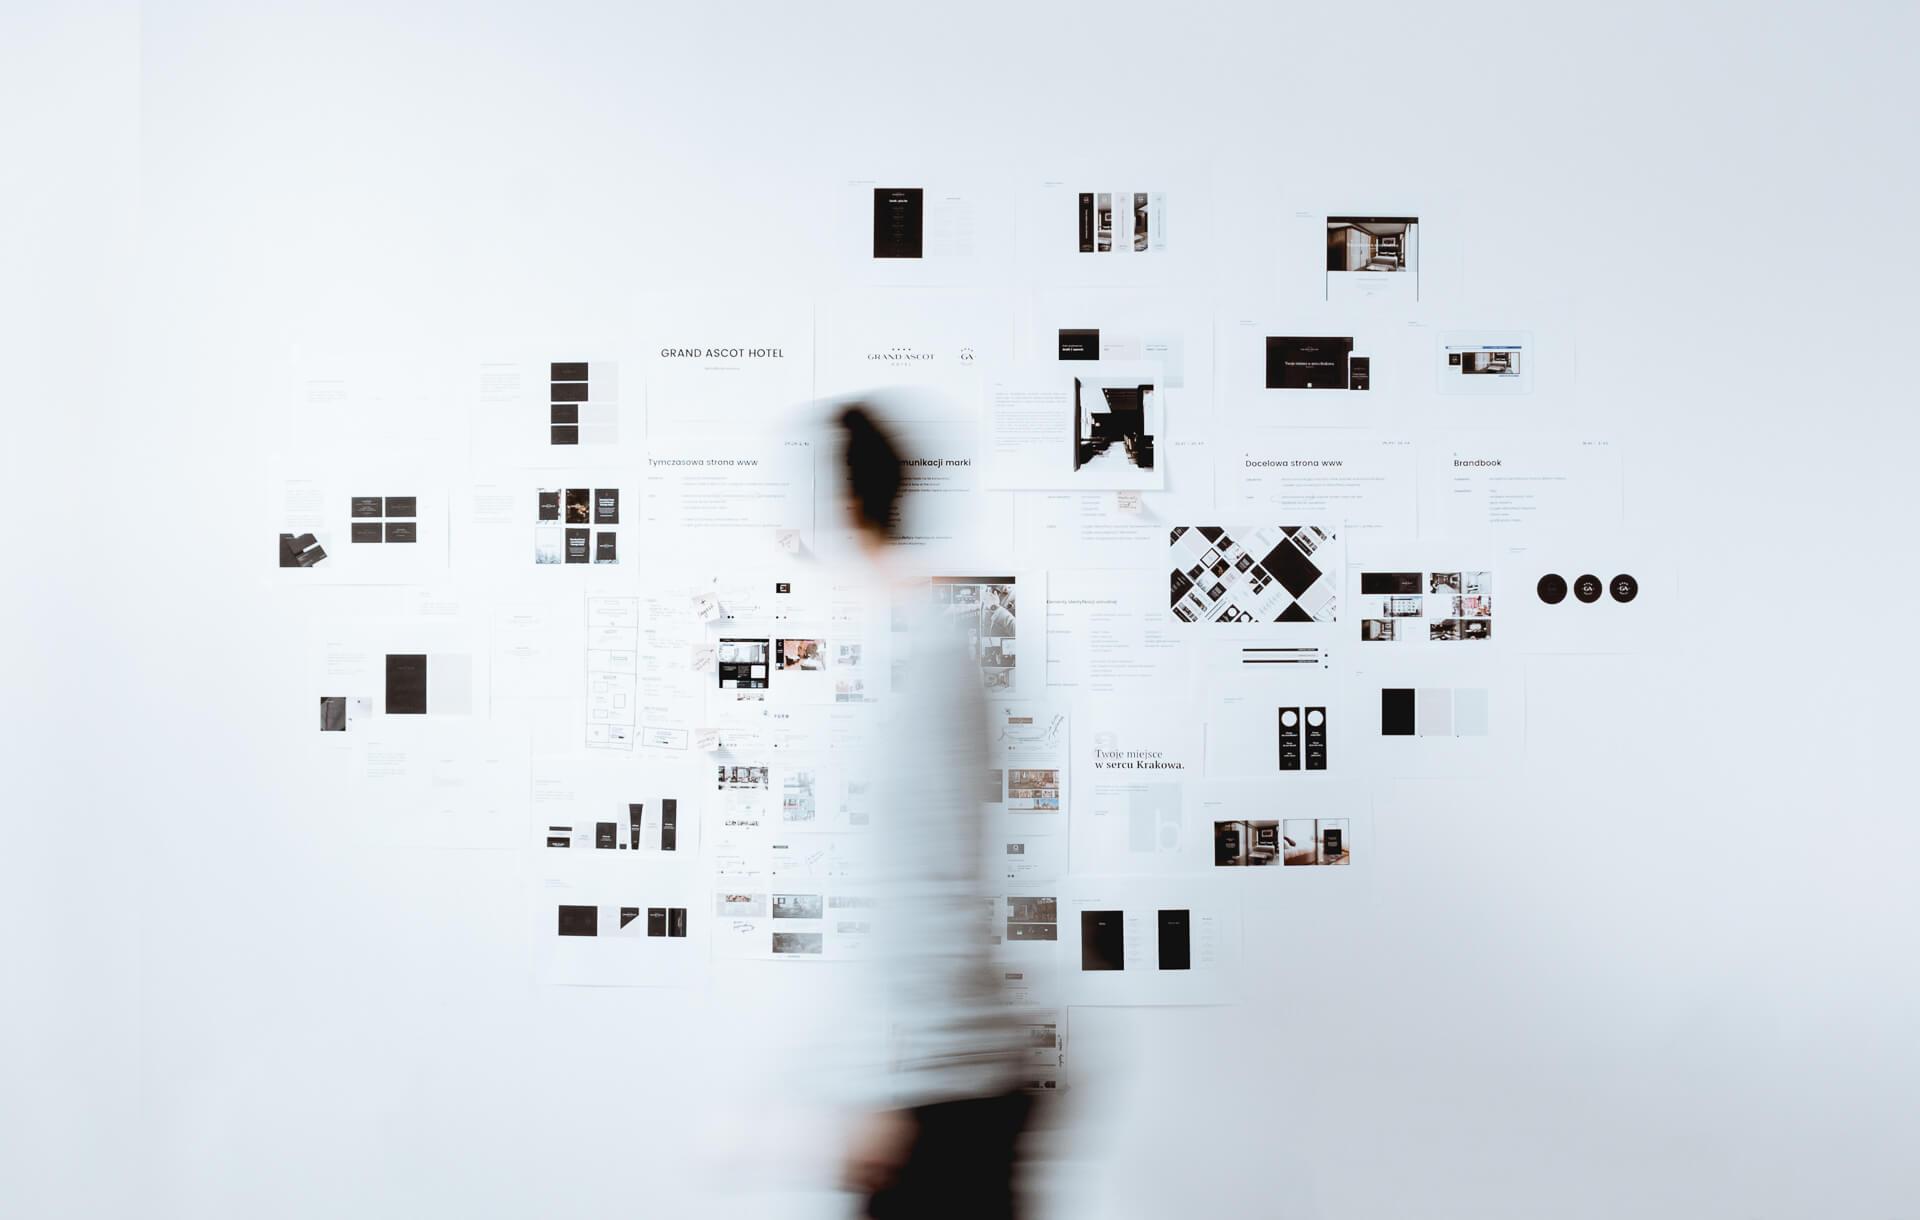 Dominik-Pacholczyk-Logo-Design-Branding-Idenitity-Wall-2-kopia